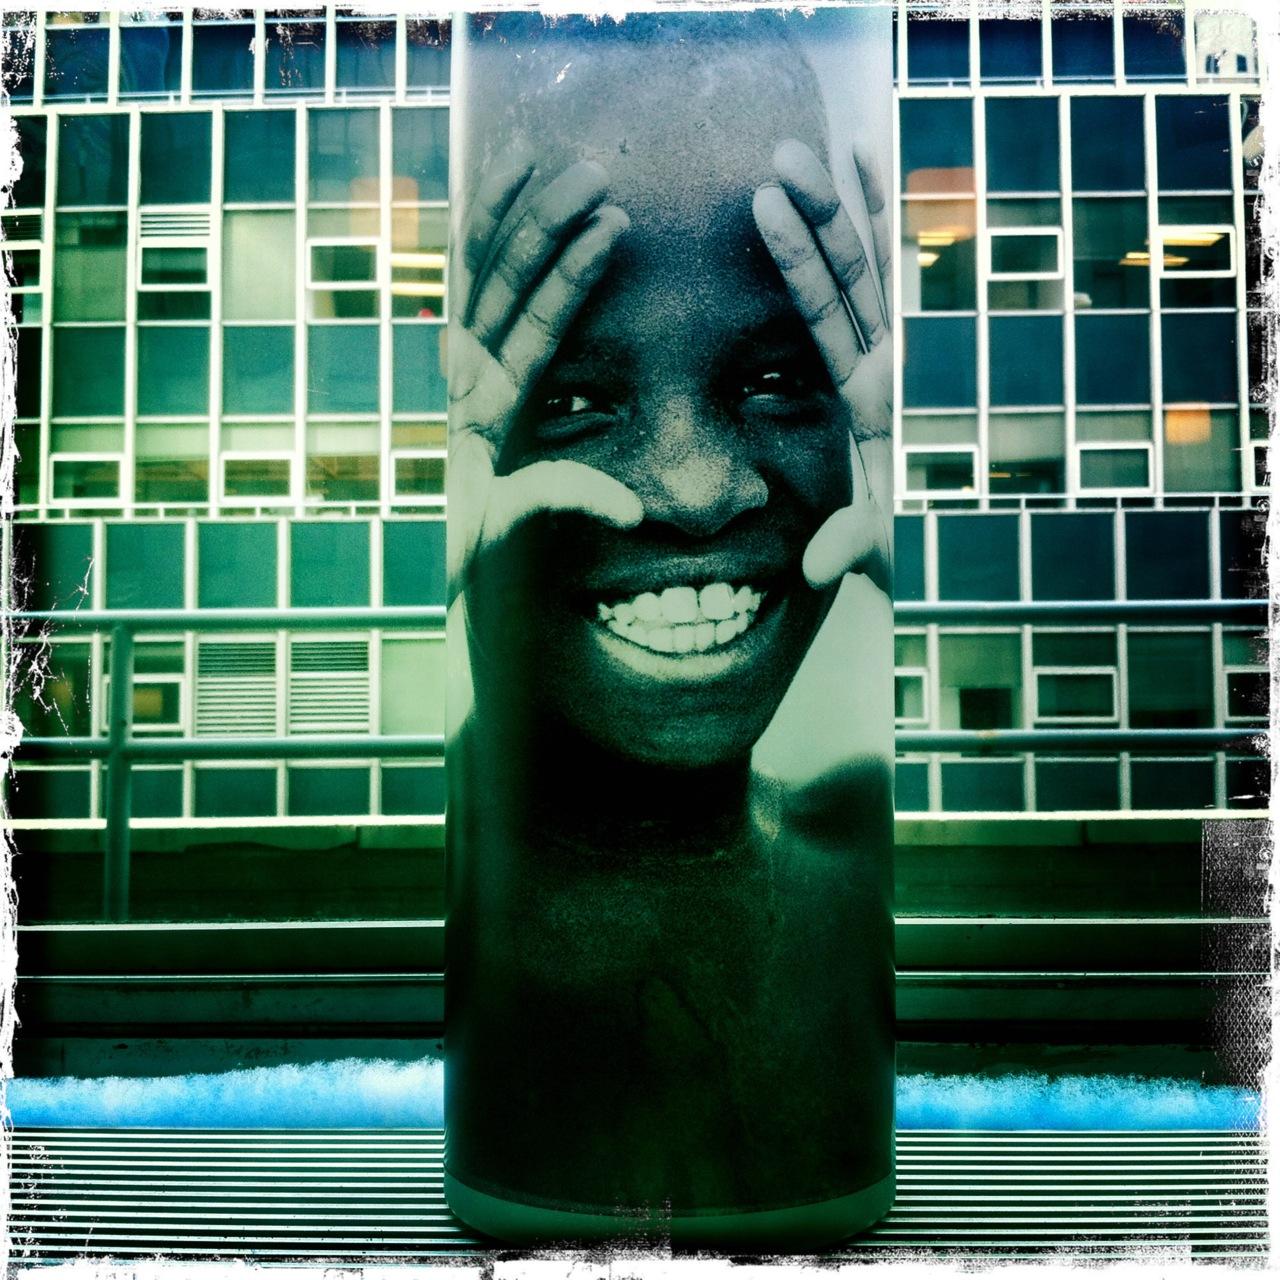 Smiling boy on votive.